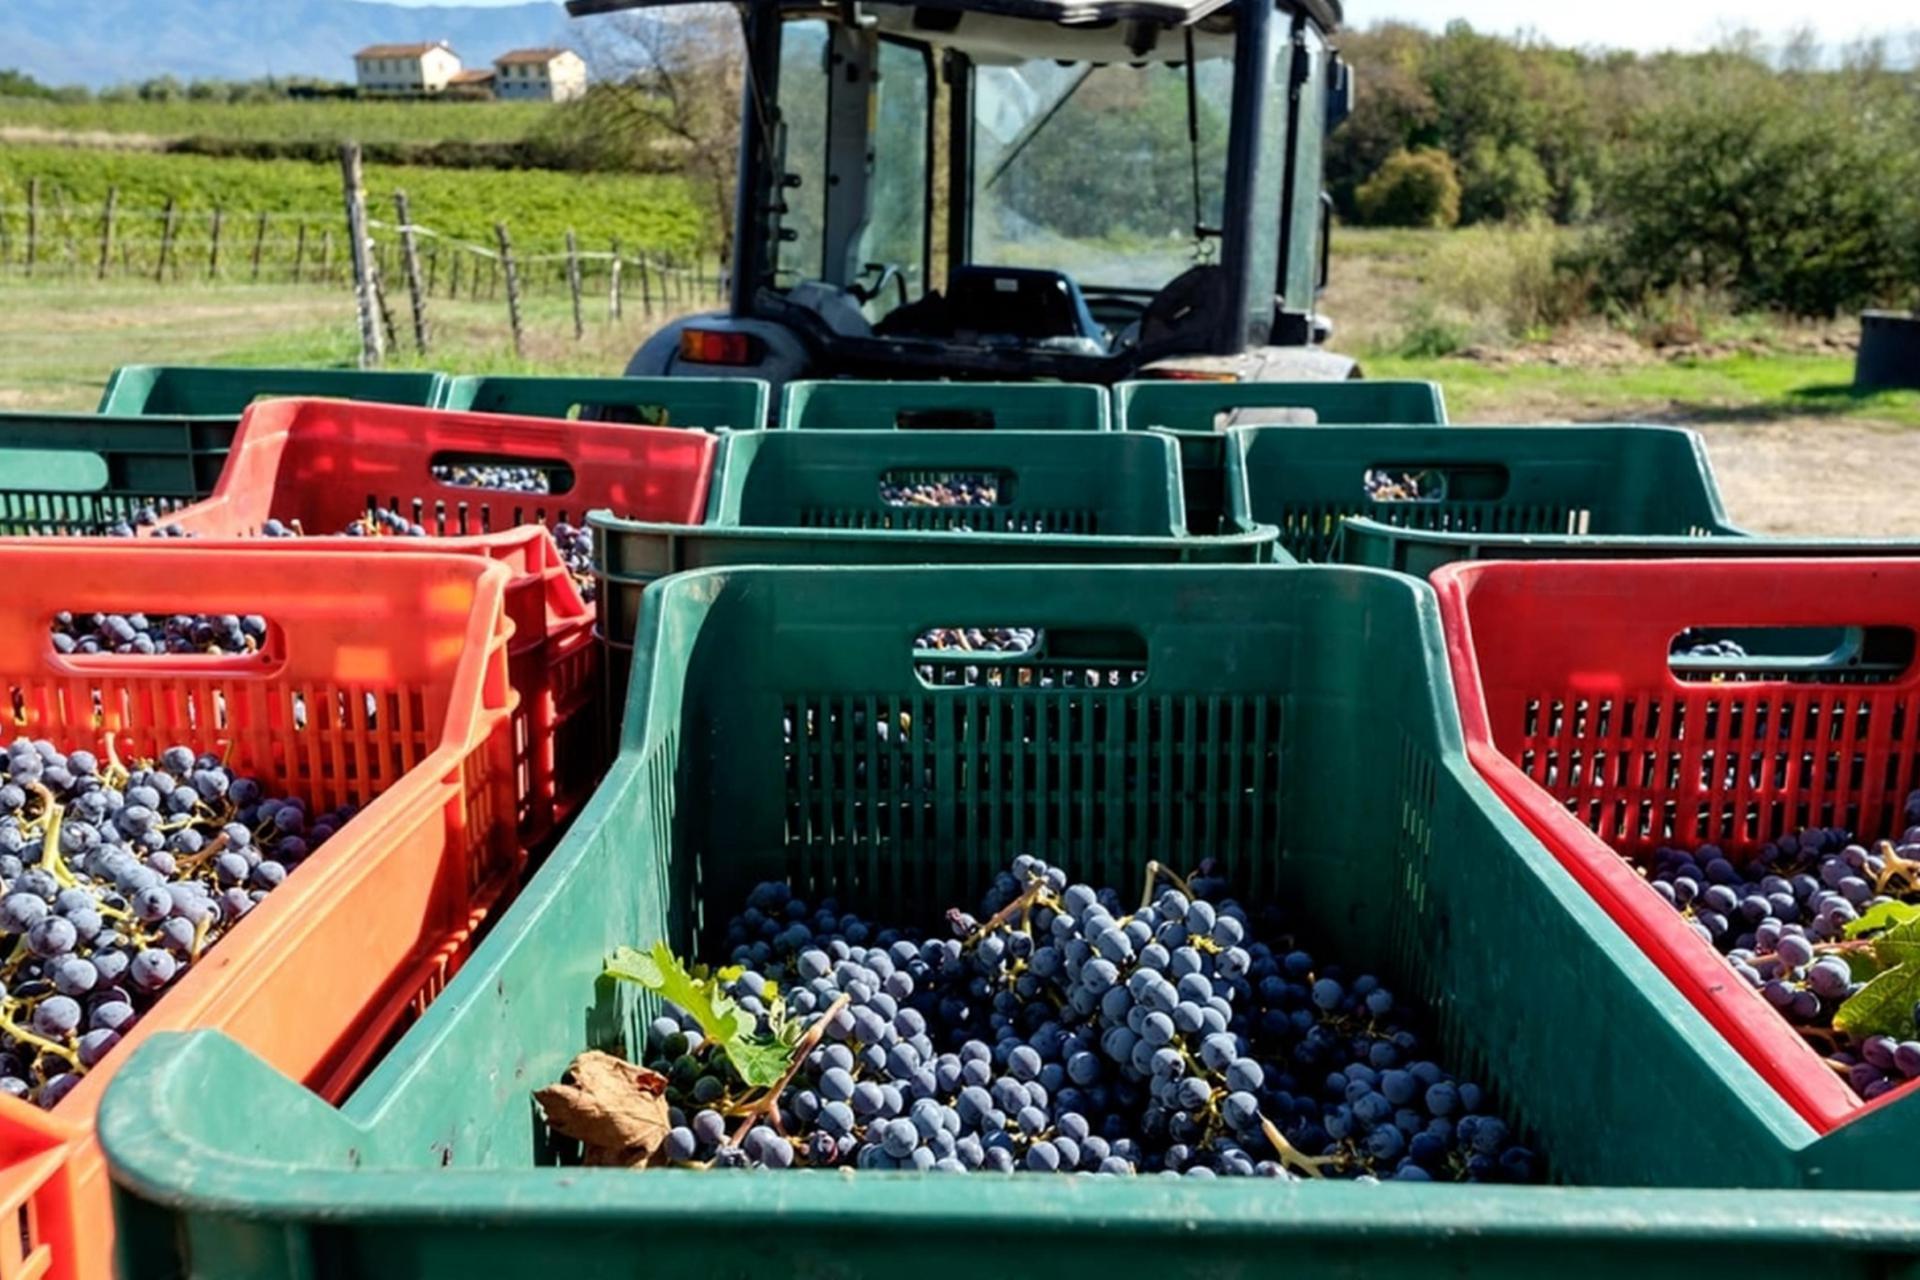 Agriturismo Toscane Mooie wijn agriturismo in de Chiantistreek, Toscane